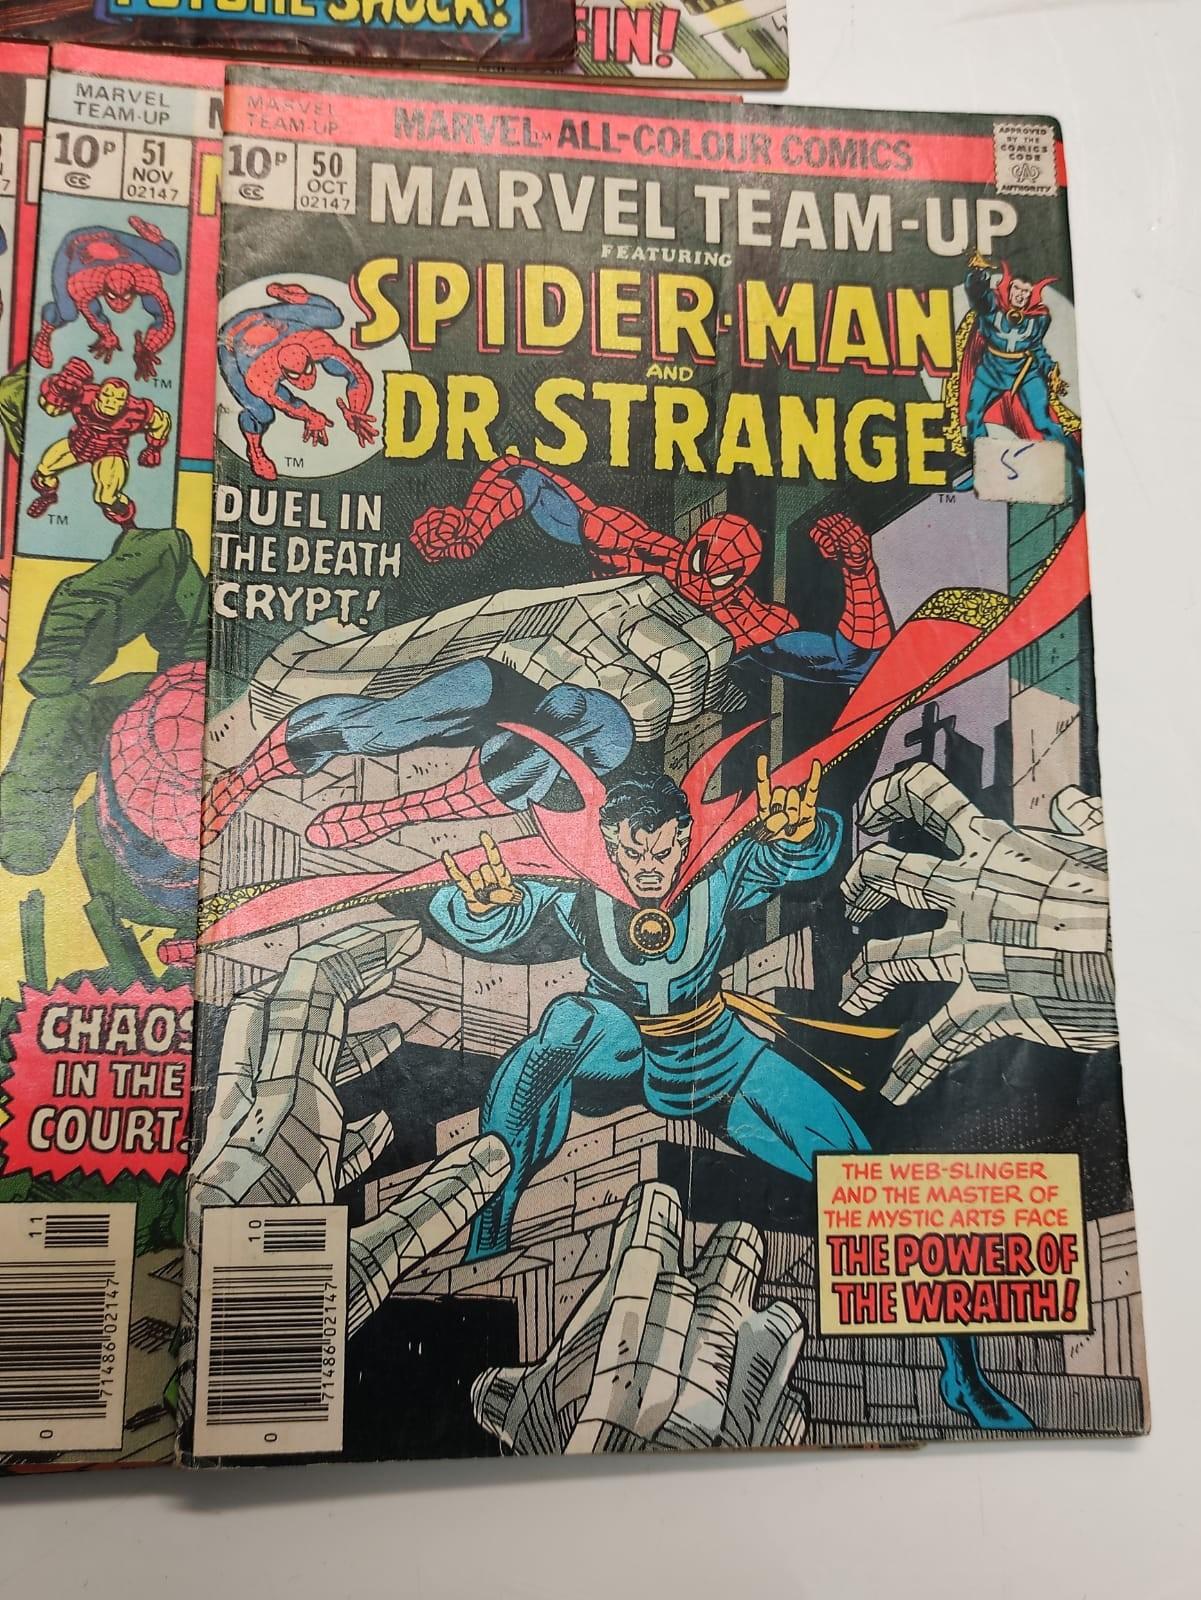 24 x Marvel comics. Marvel Team-Up featuring Spider-Man. 1977 - 1980. - Image 8 of 10